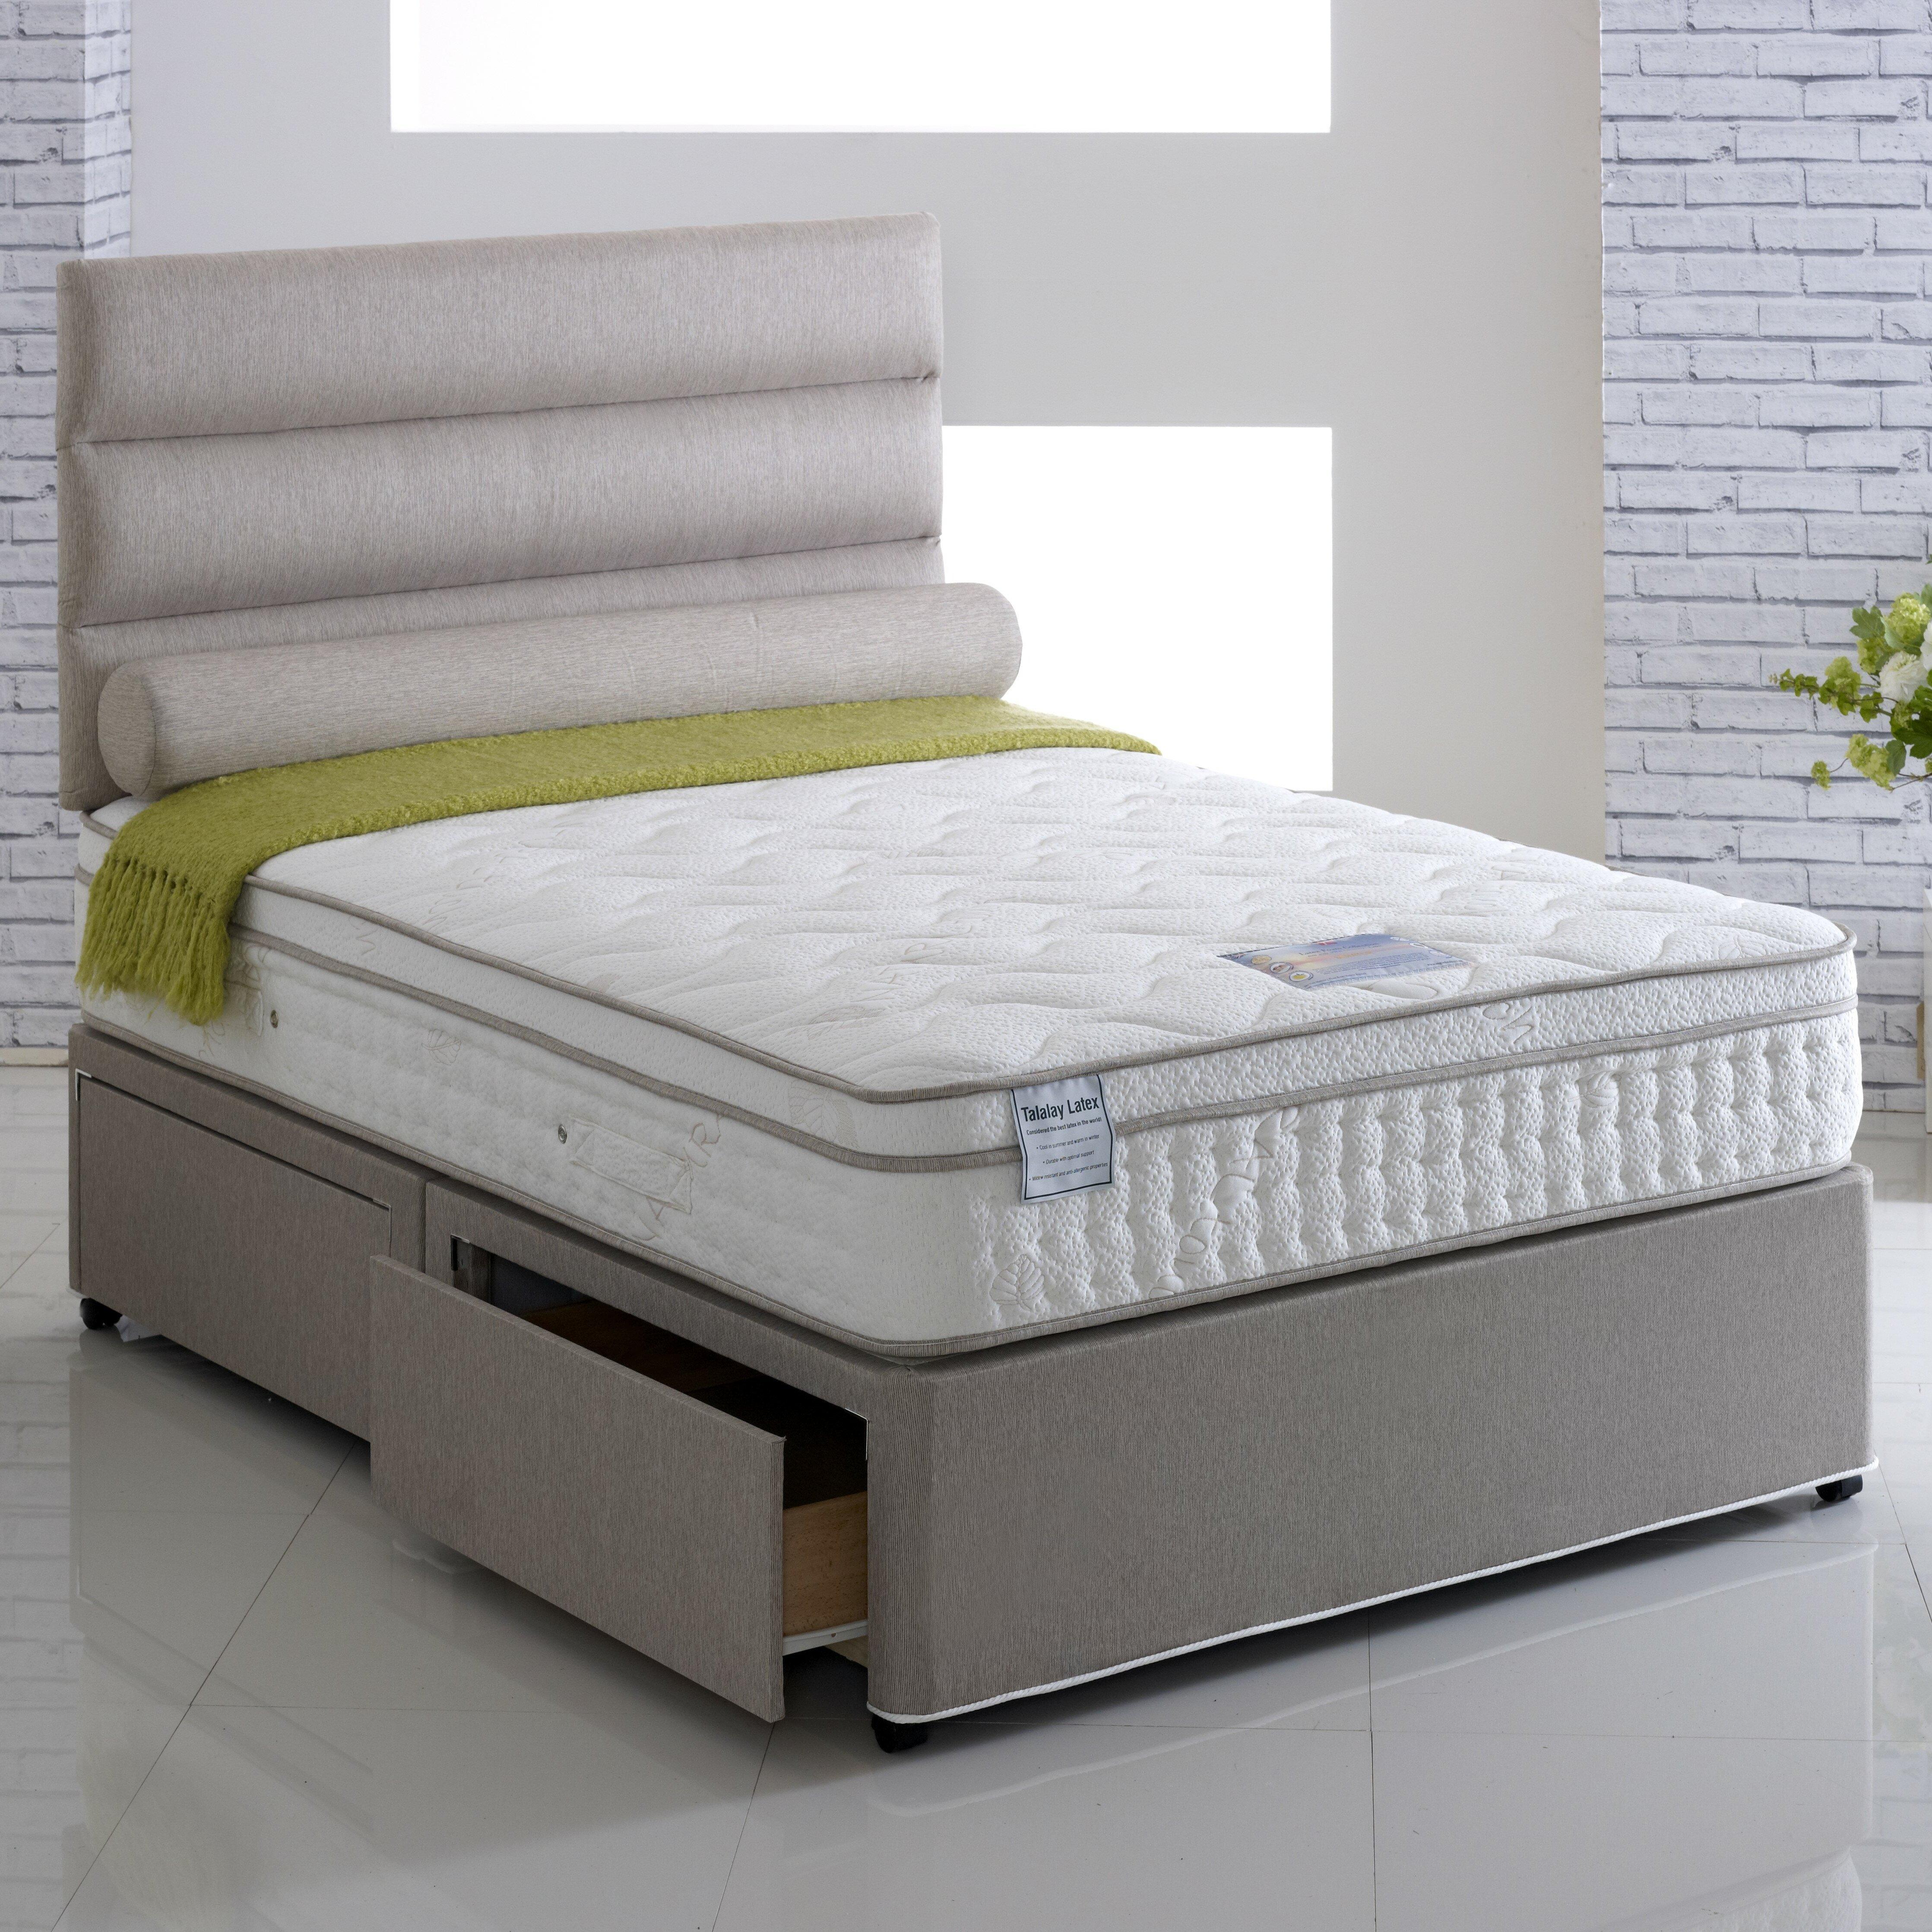 all home pocket sprung 2000 mattress reviews wayfair uk. Black Bedroom Furniture Sets. Home Design Ideas